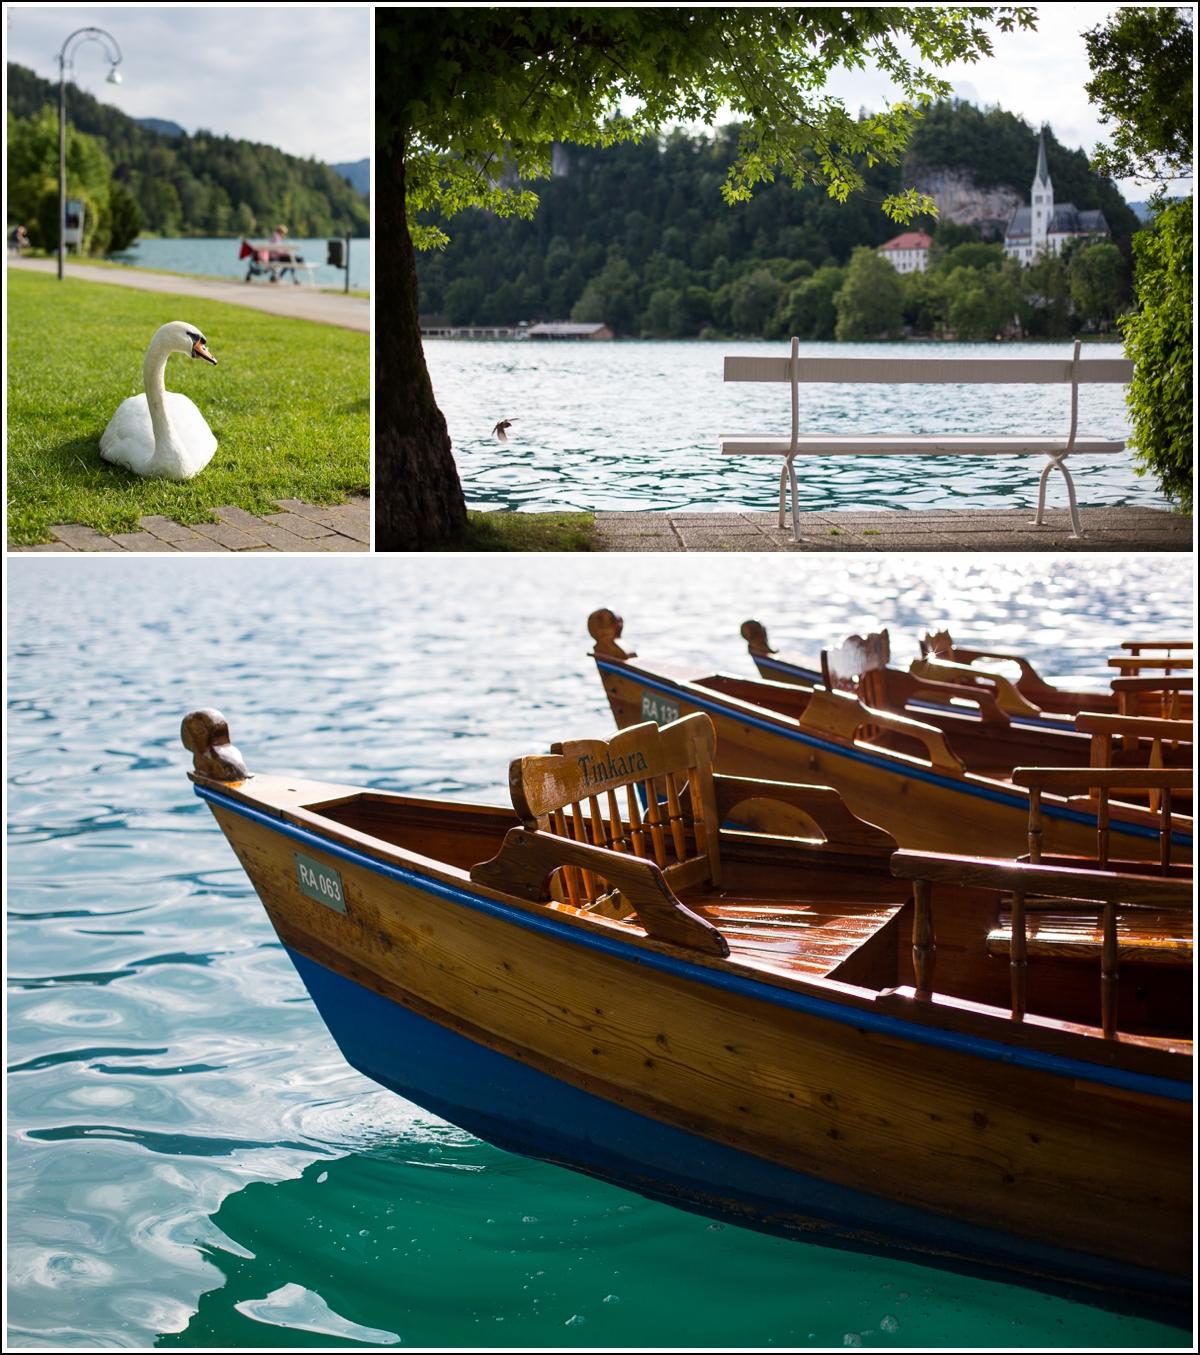 bled-lake-swan-slovenia